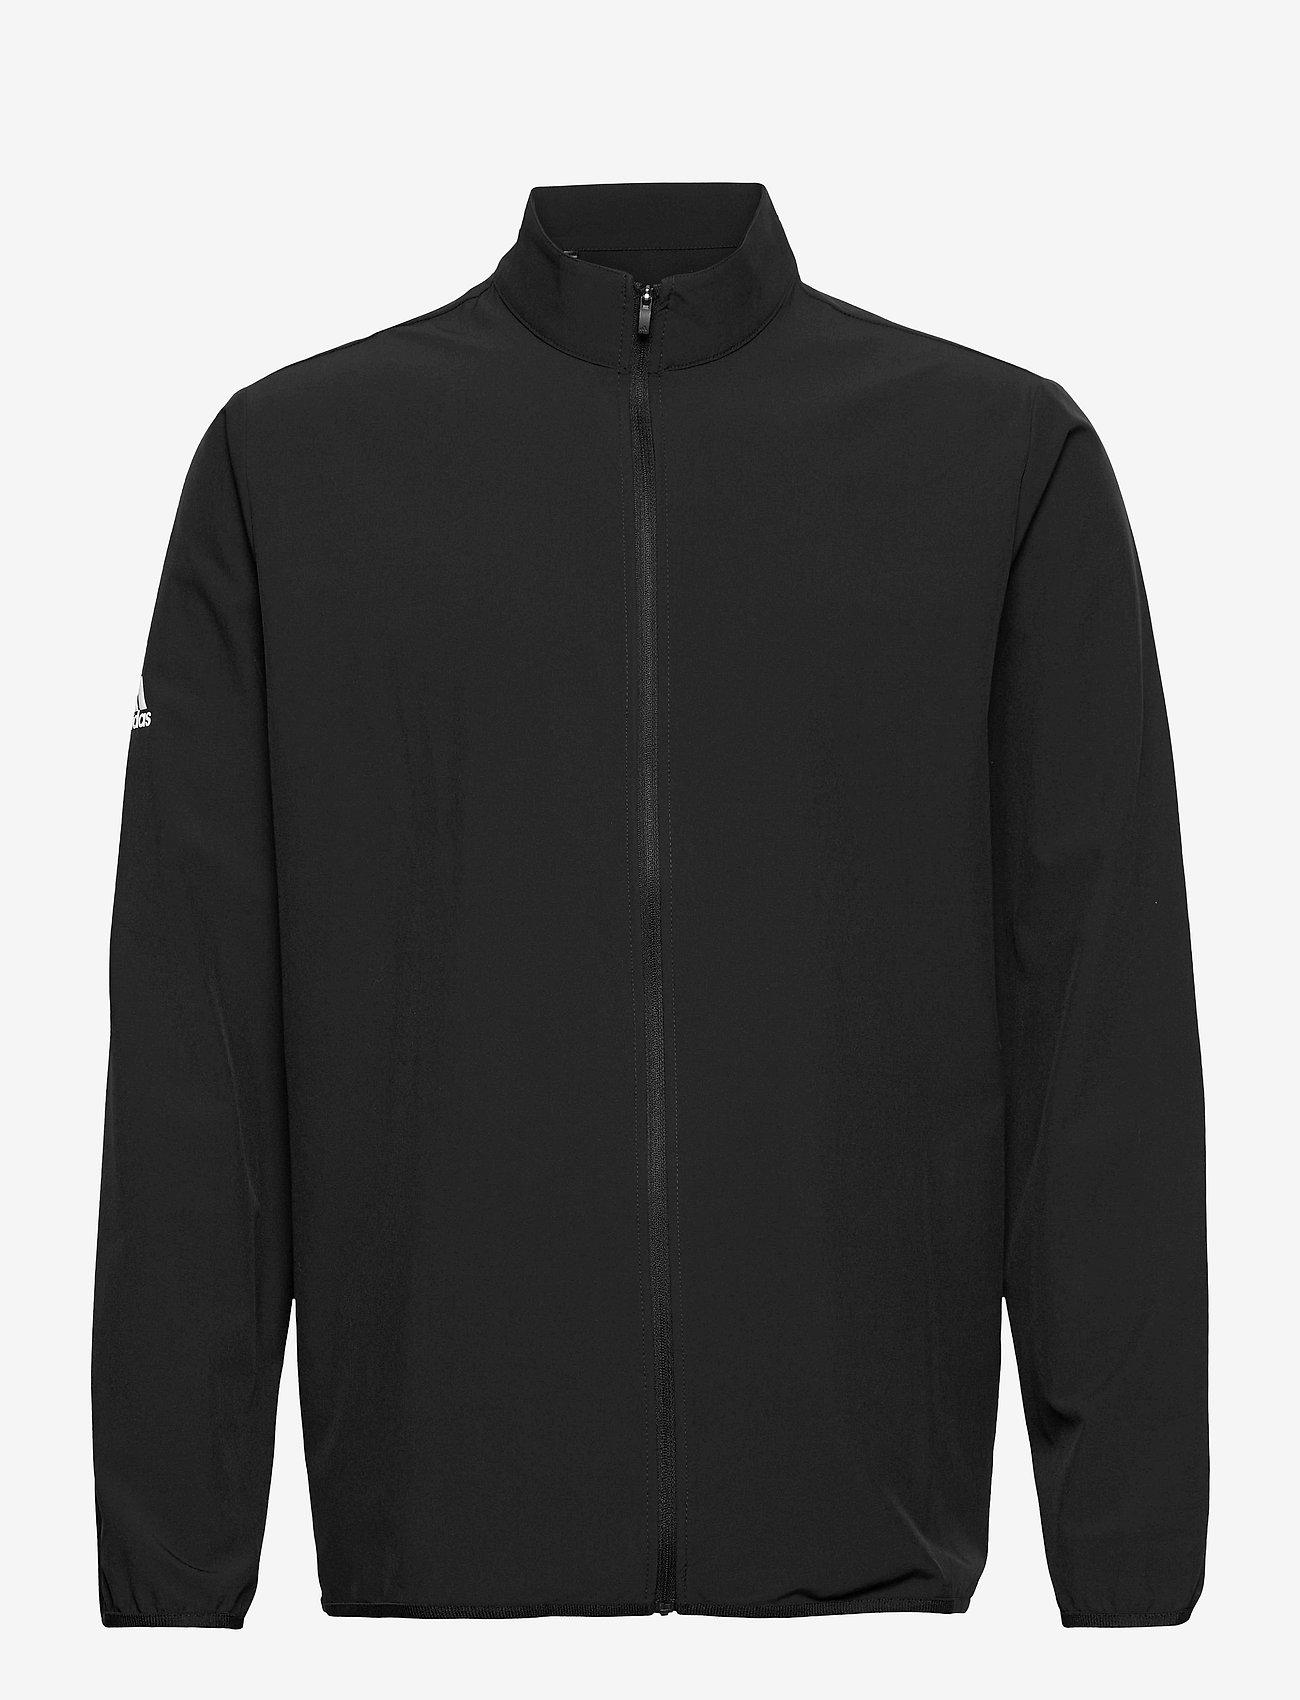 adidas Golf - CORE WIND J - golf jackets - black - 0